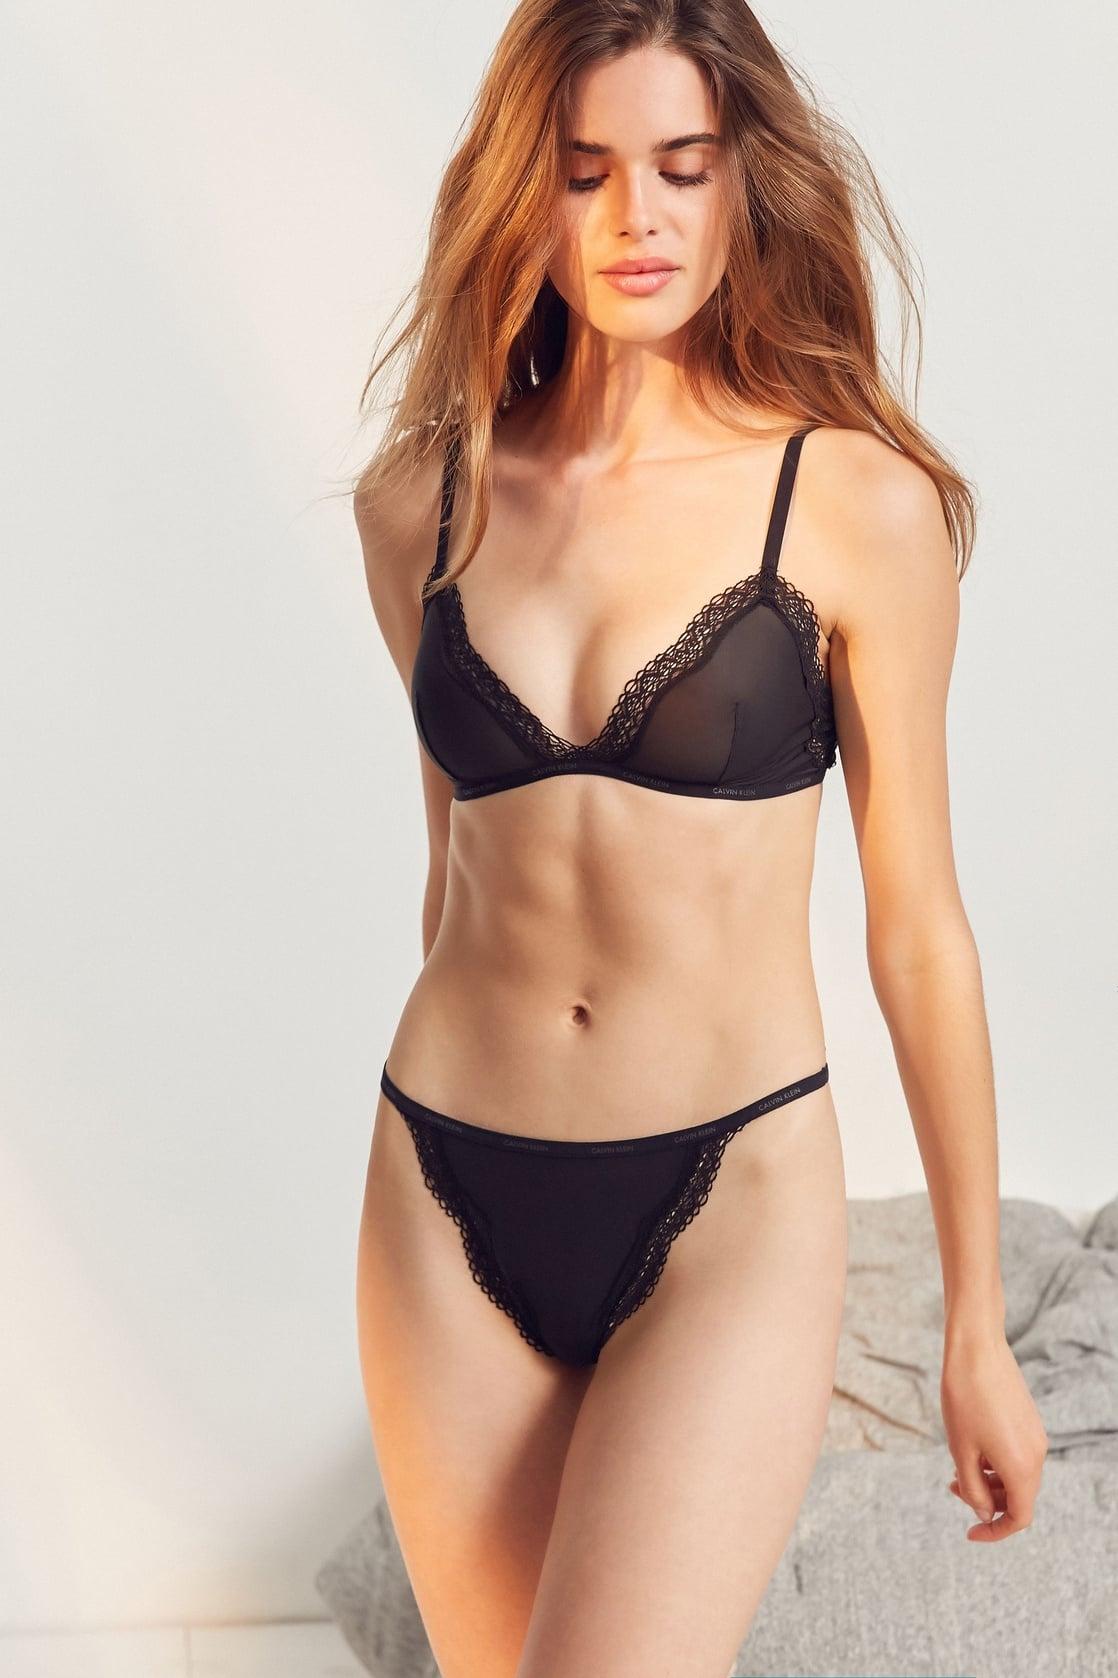 Bikini Zoi Mantzakanis nude (69 photo), Ass, Paparazzi, Instagram, lingerie 2017